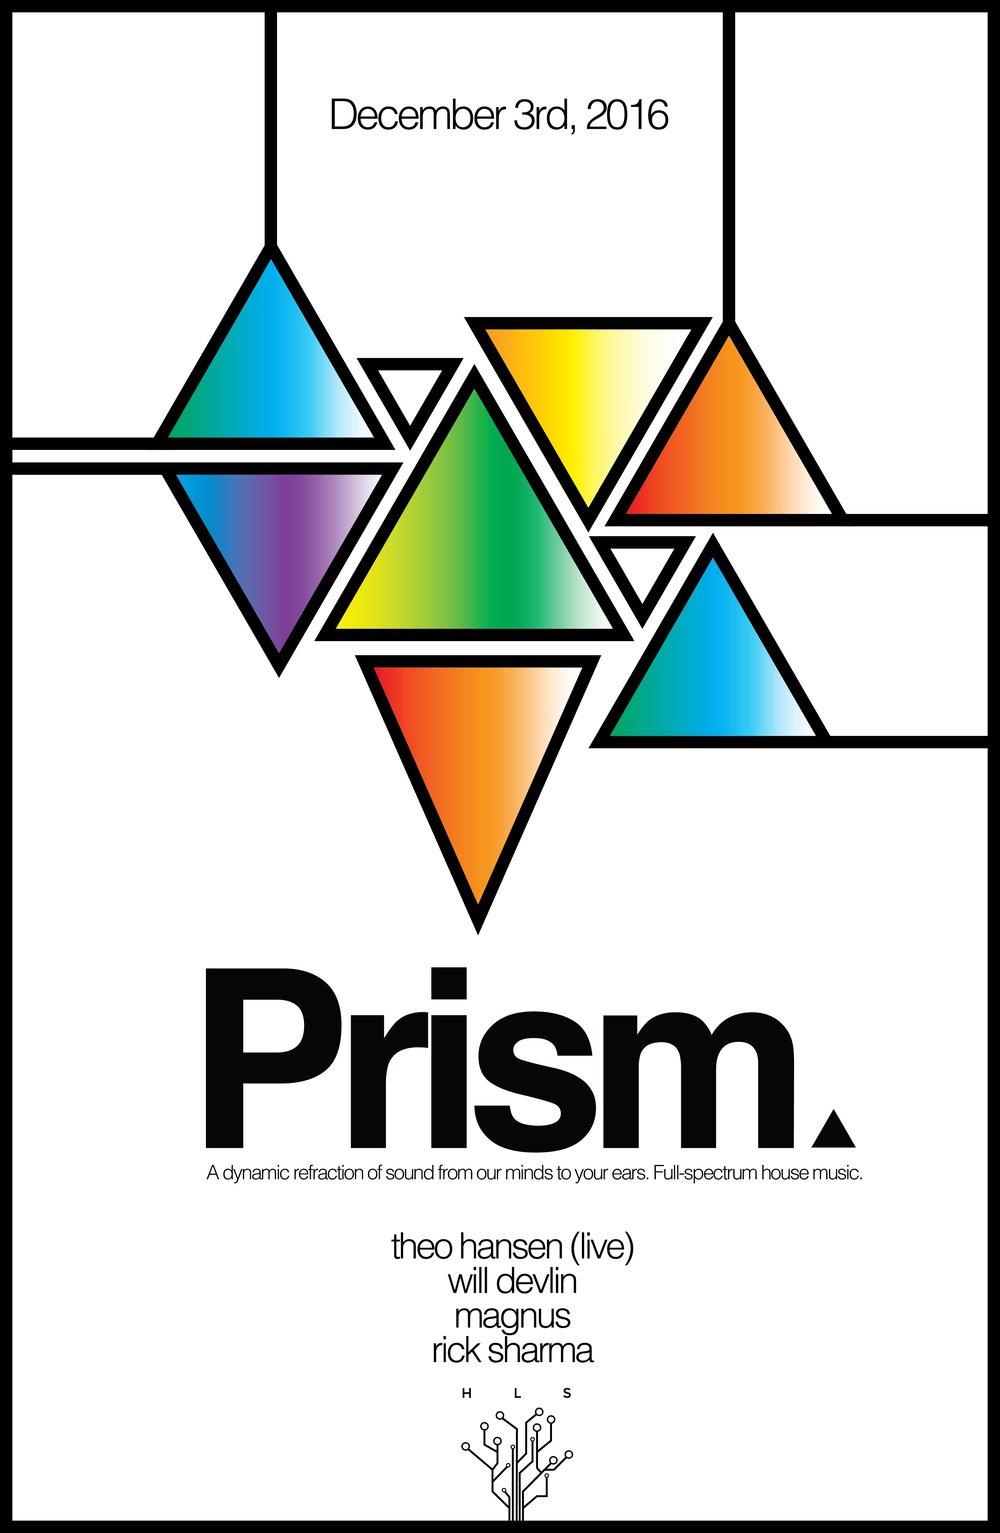 prism-habitat-living-sound.jpeg